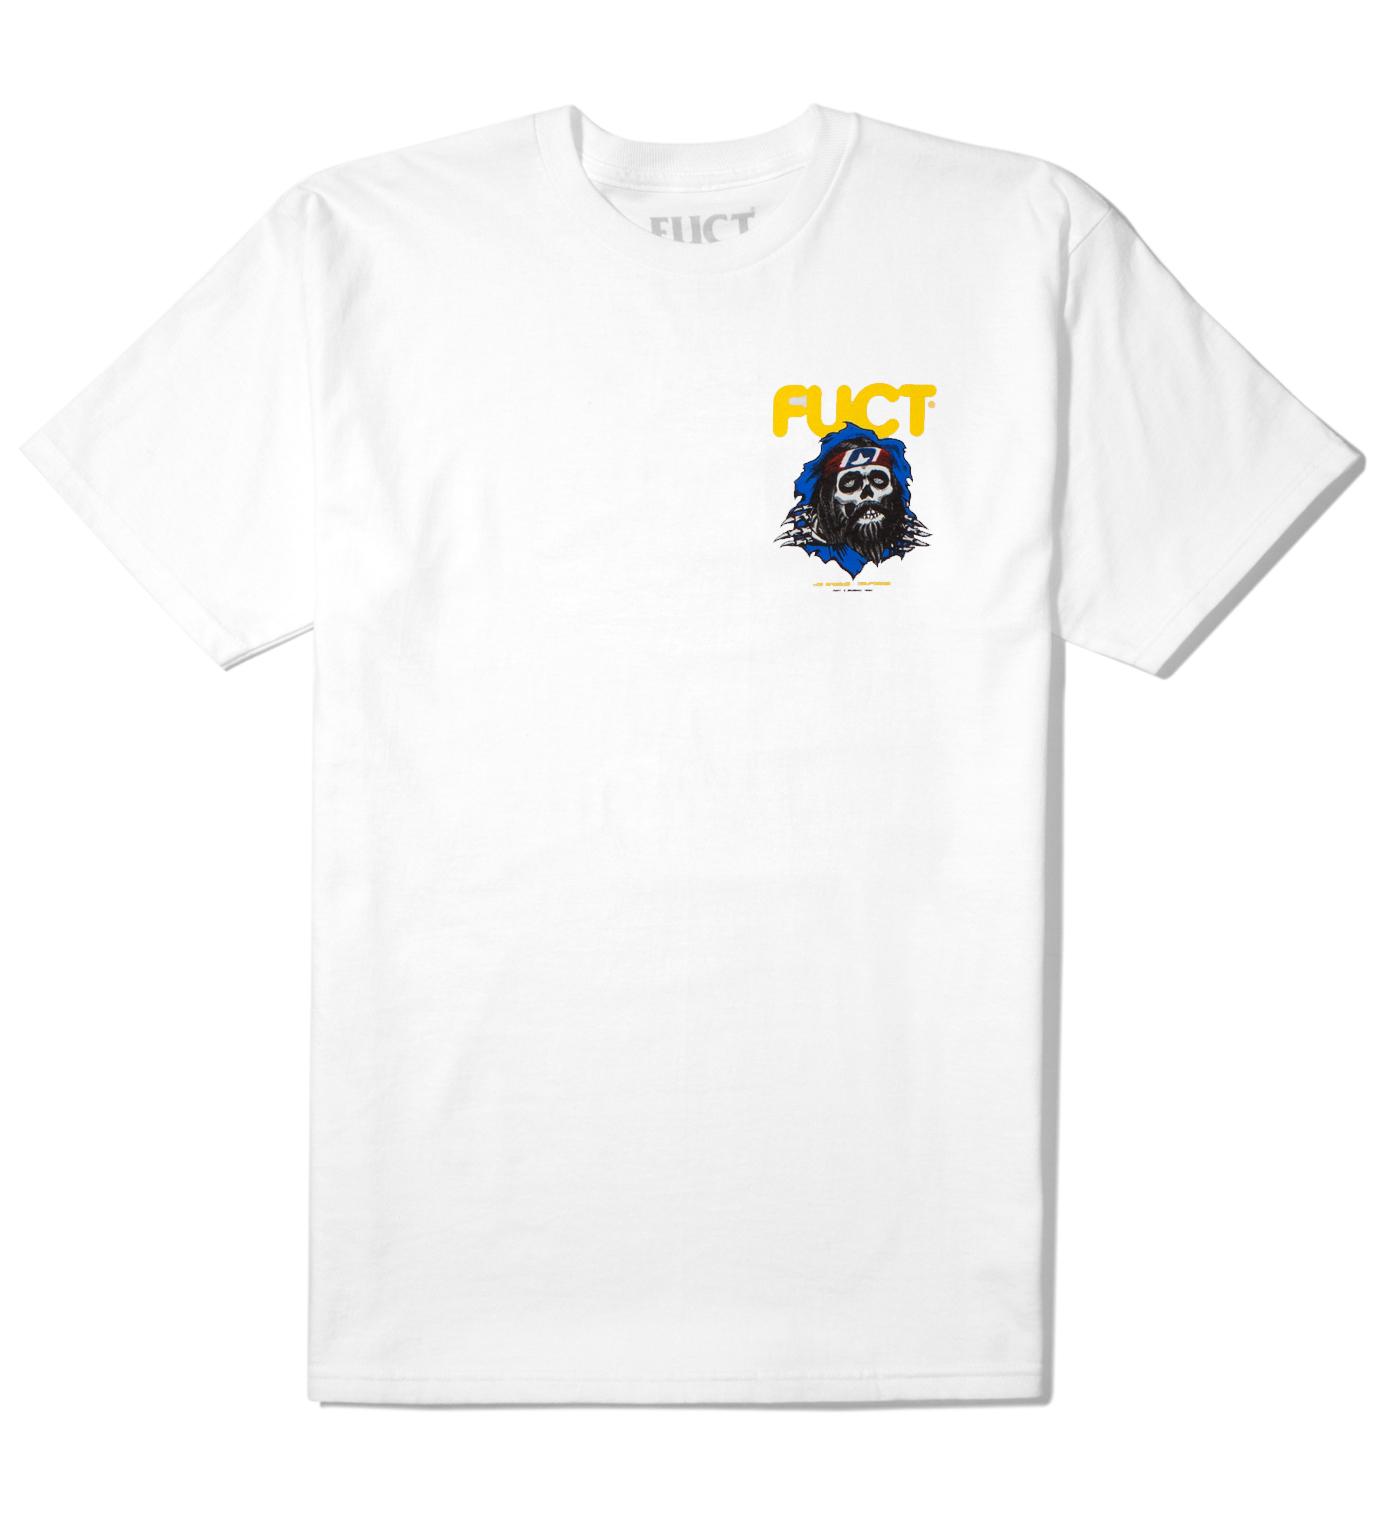 FUCT White Bong Ripper T-Shirt